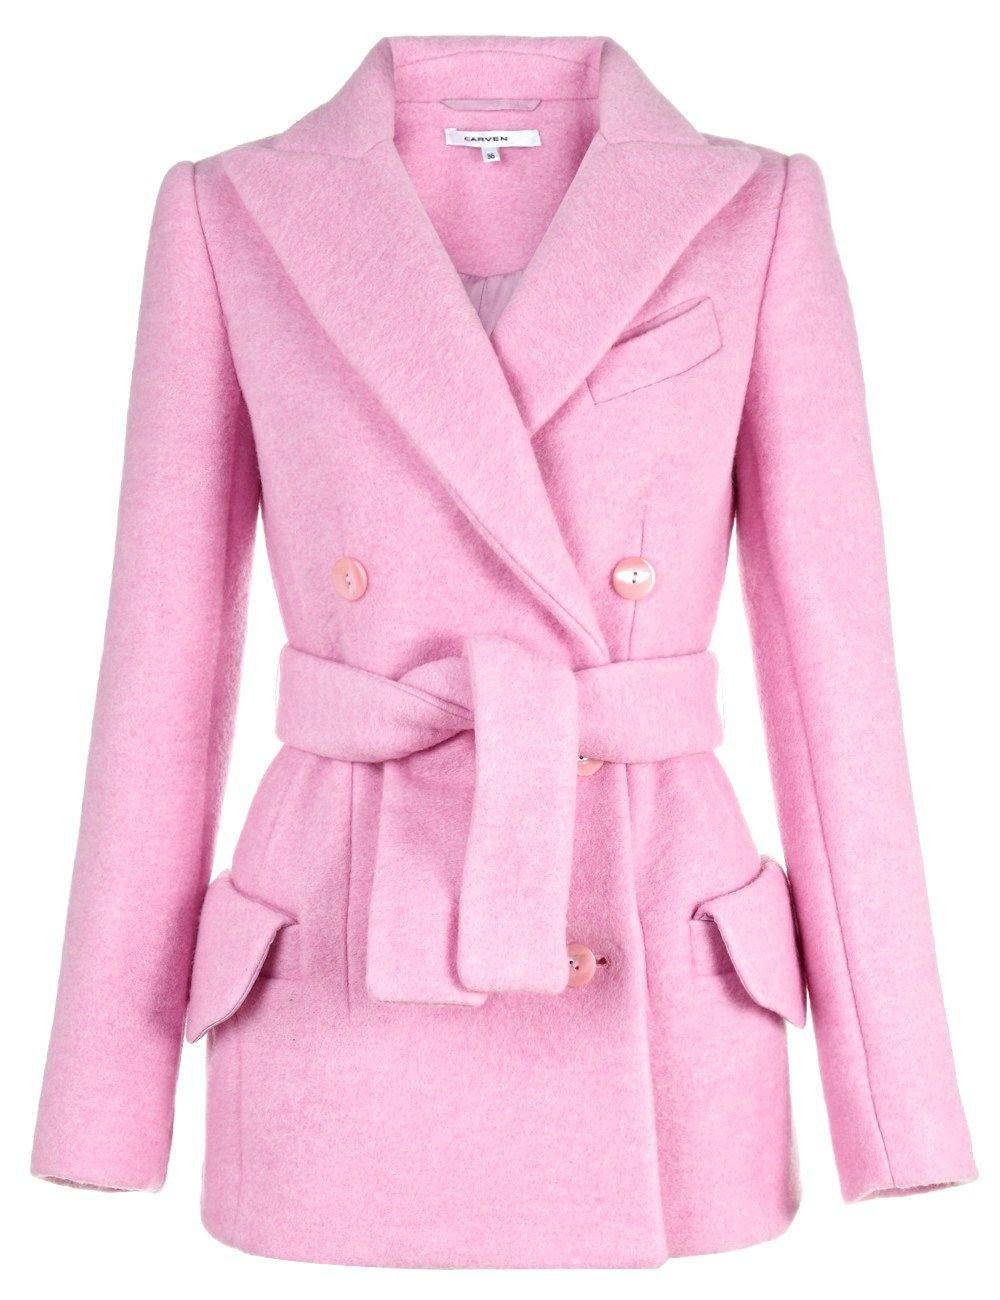 Pink Crushed Wool Jacket | Carven | Avenue32 | Jackets | Pinterest ...